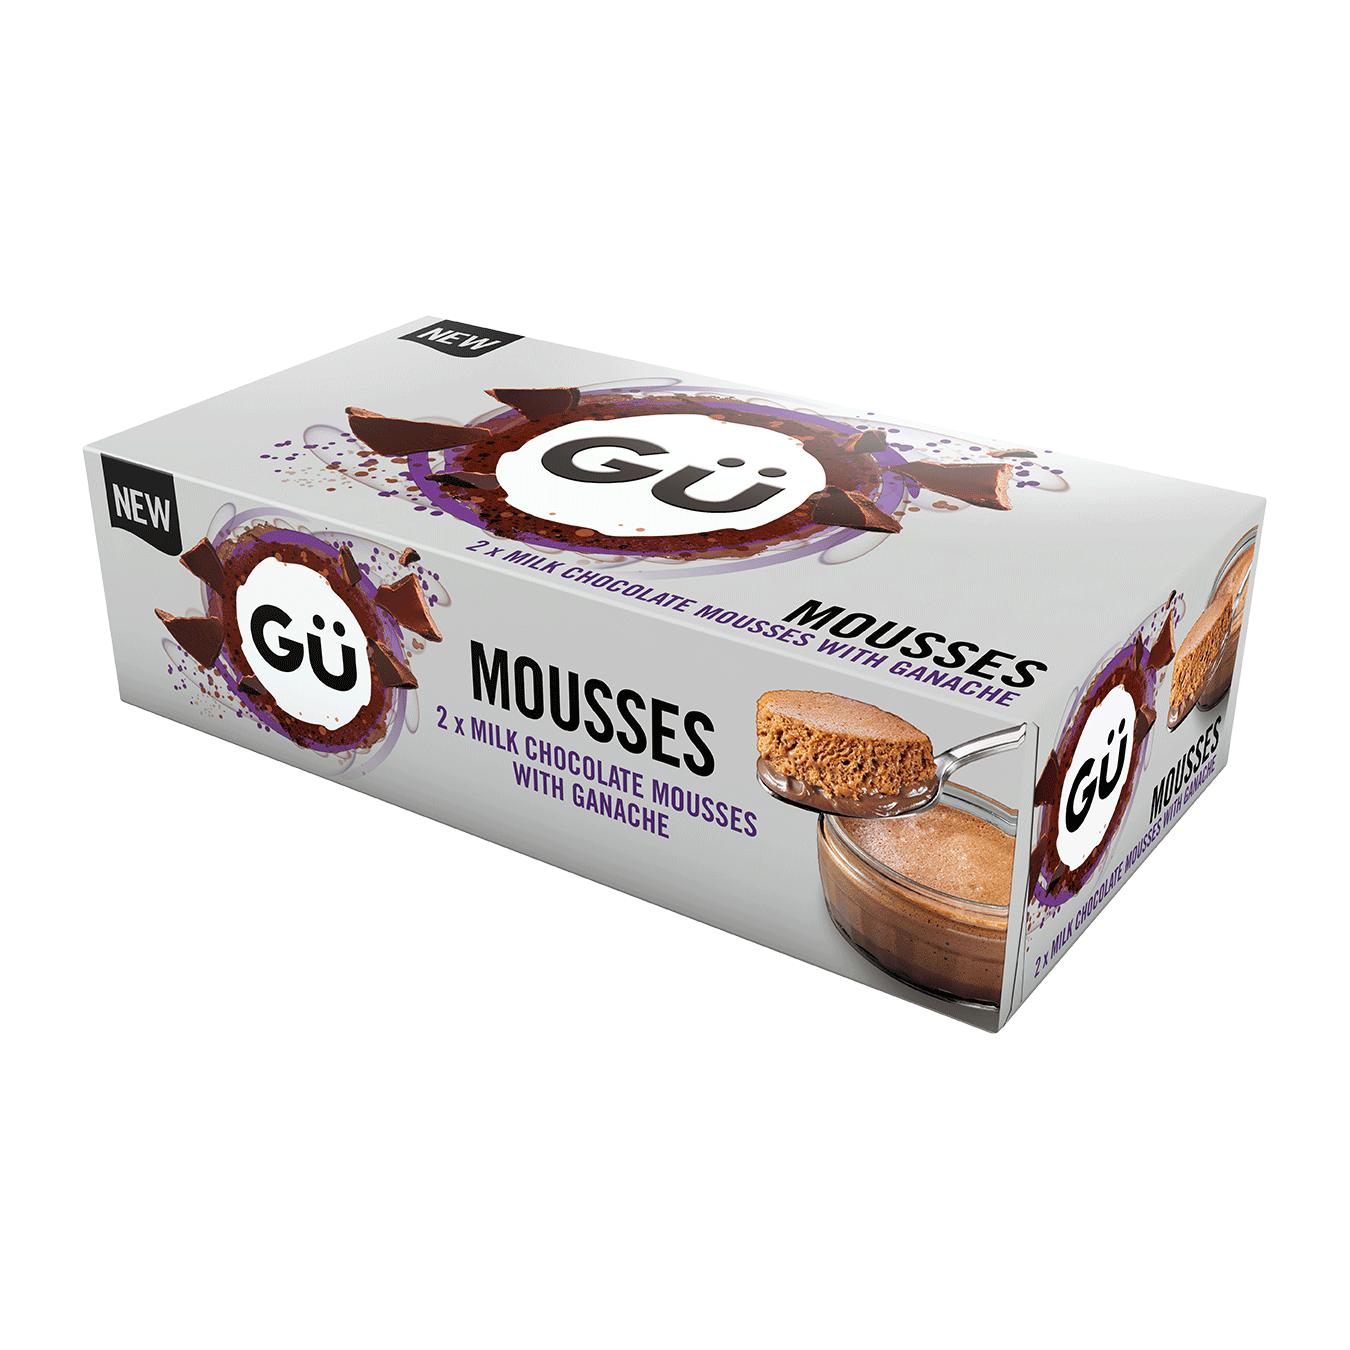 Milk Chocolate Mousse & Ganache